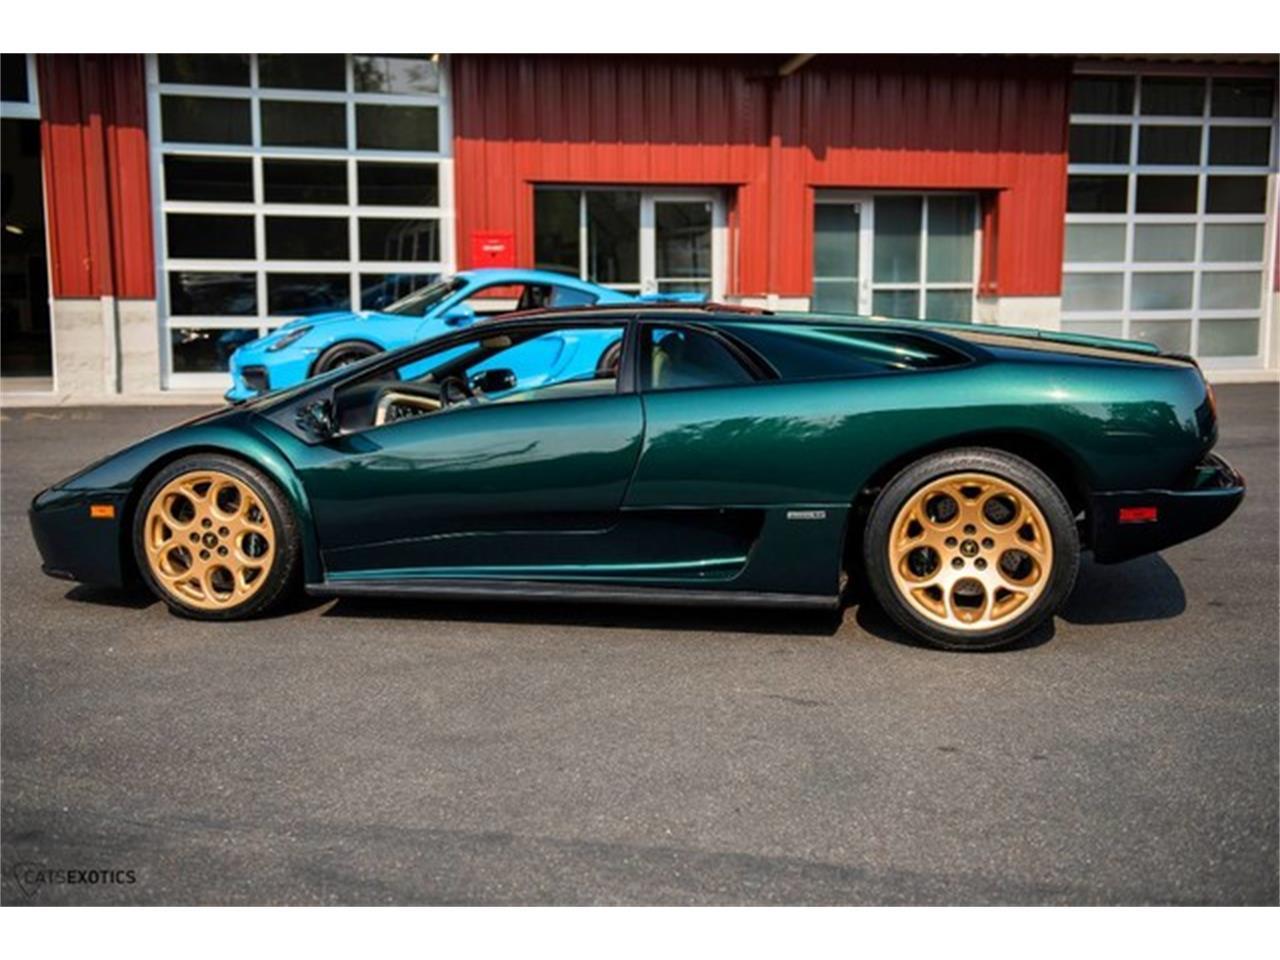 Large Picture of '01 Lamborghini Diablo located in Seattle Washington - $375,000.00 - KWB9